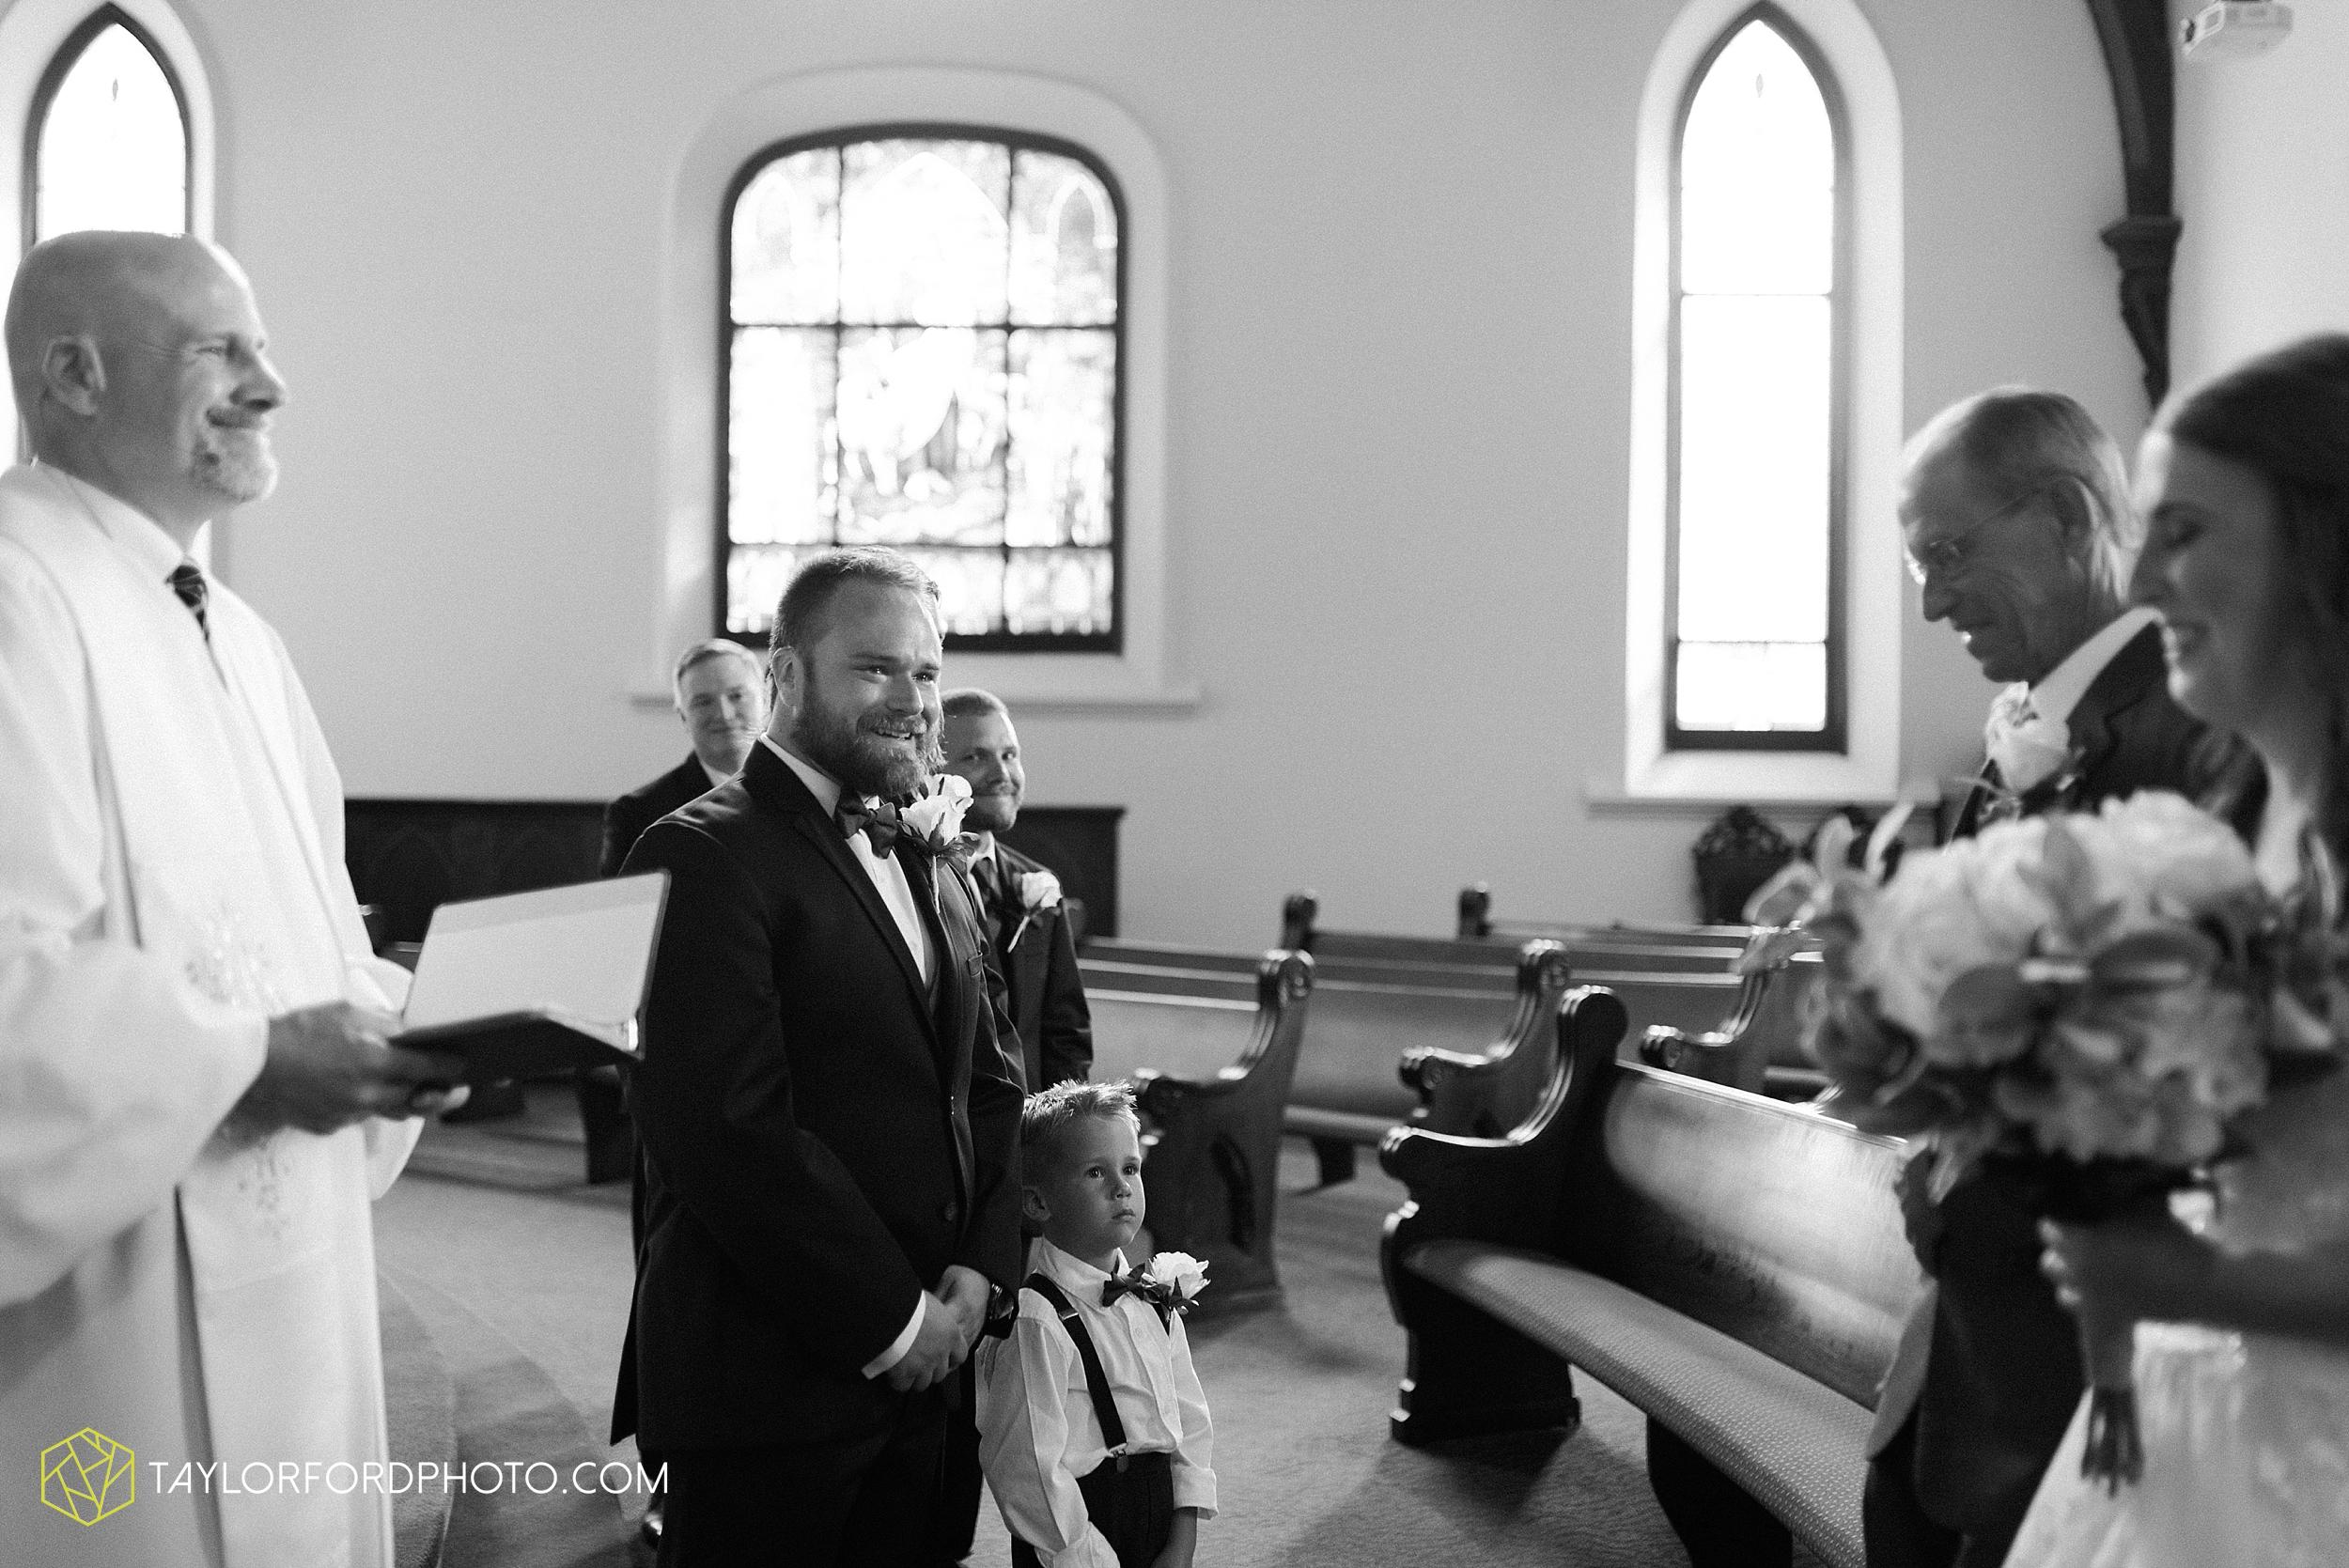 chelsey-zosh-jackson-young-first-united-methodist-church-senior-center-van-wert-ohio-wedding-photographer-taylor-ford-photography_0071.jpg